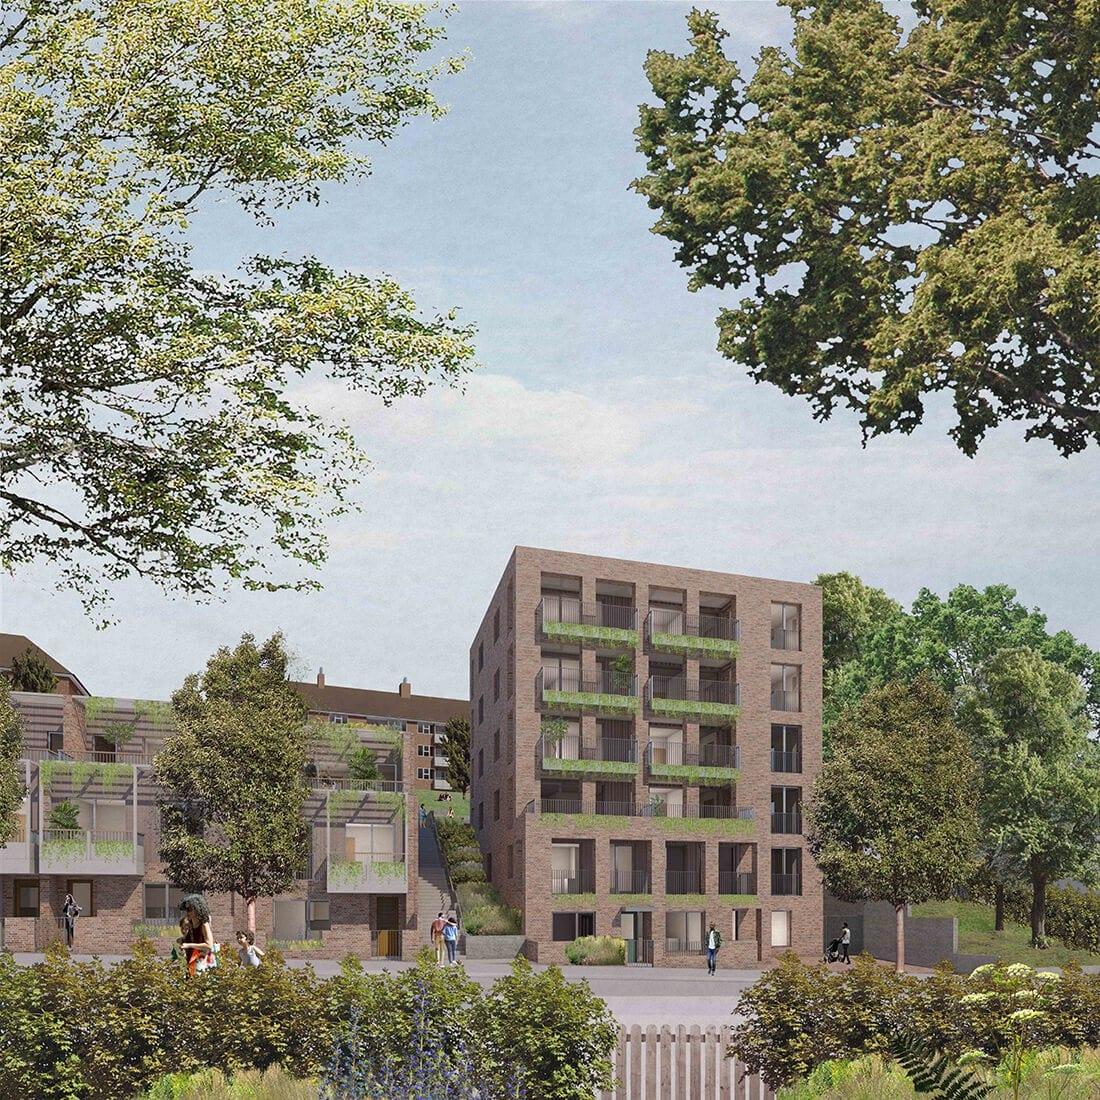 Kingsdown Avenue Montpelier Road Project Image